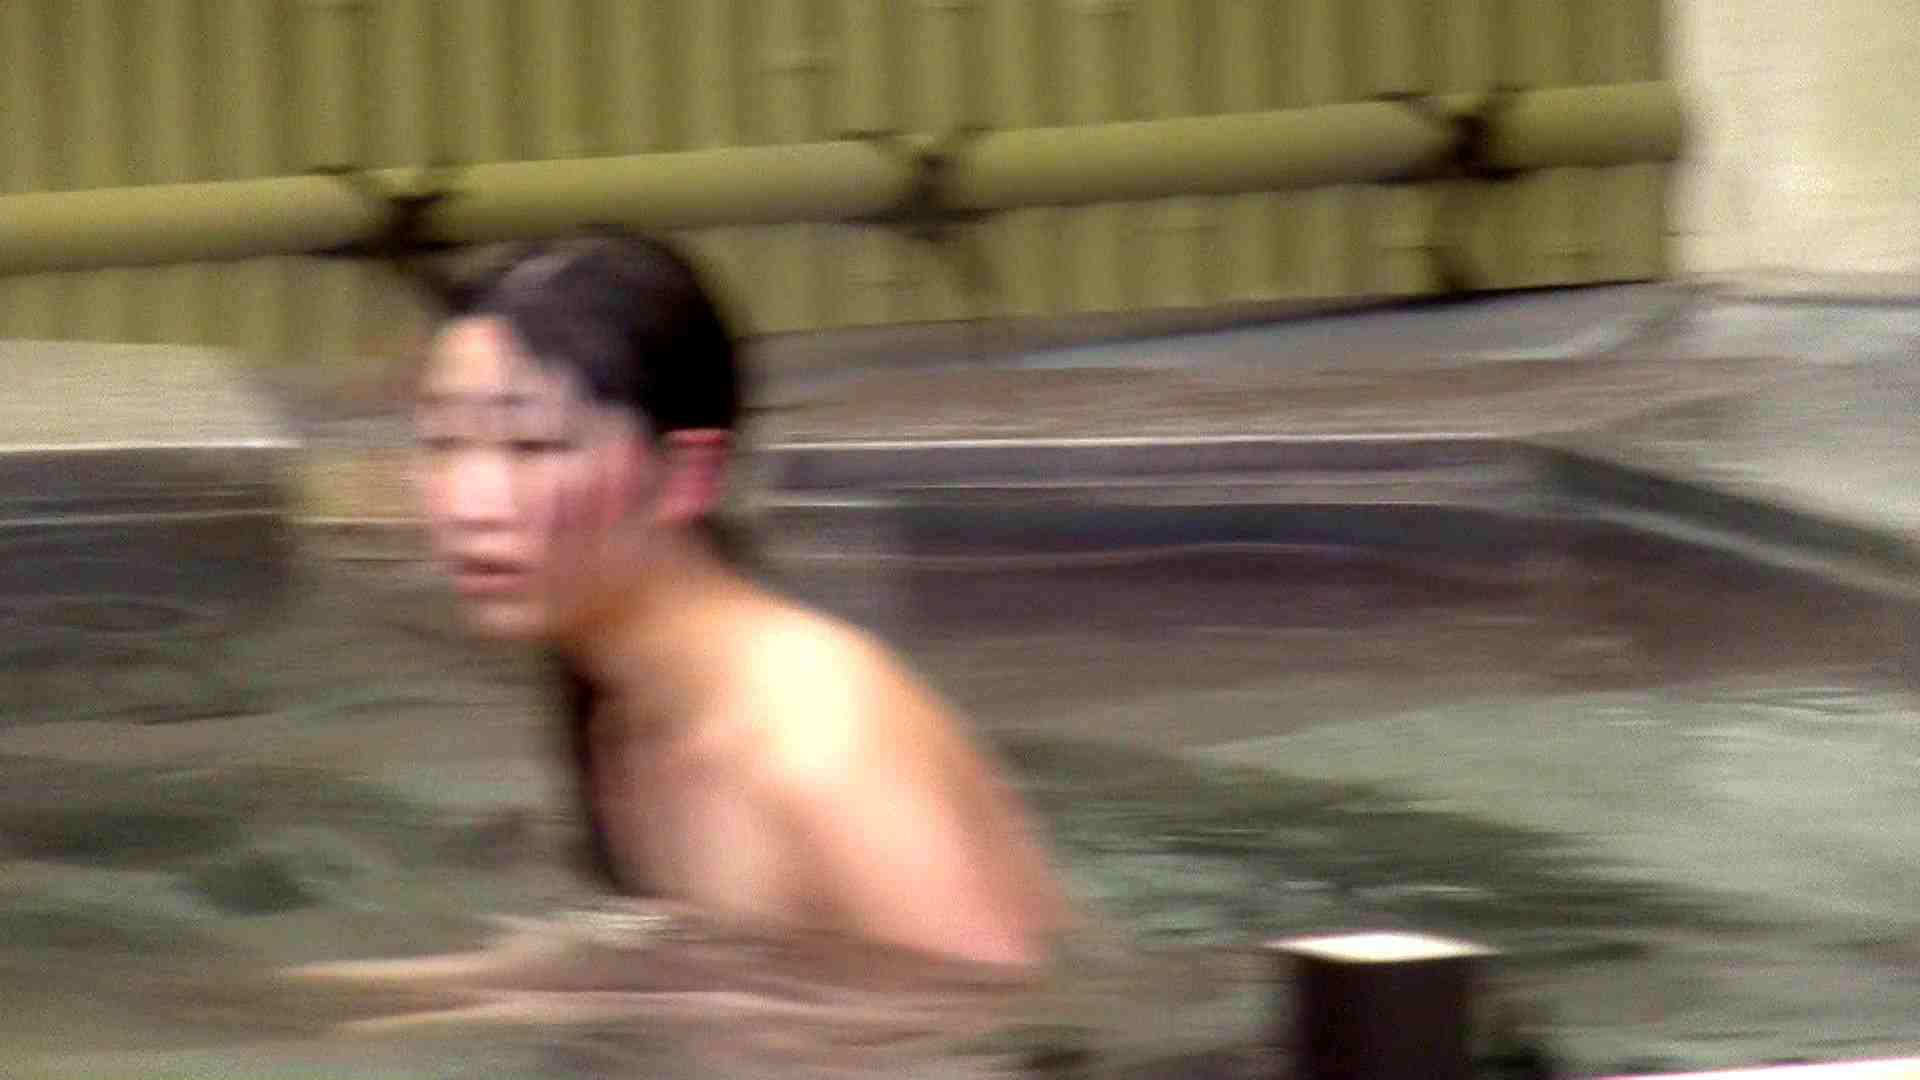 Aquaな露天風呂Vol.218 OLエロ画像 盗撮オマンコ無修正動画無料 81PICs 2